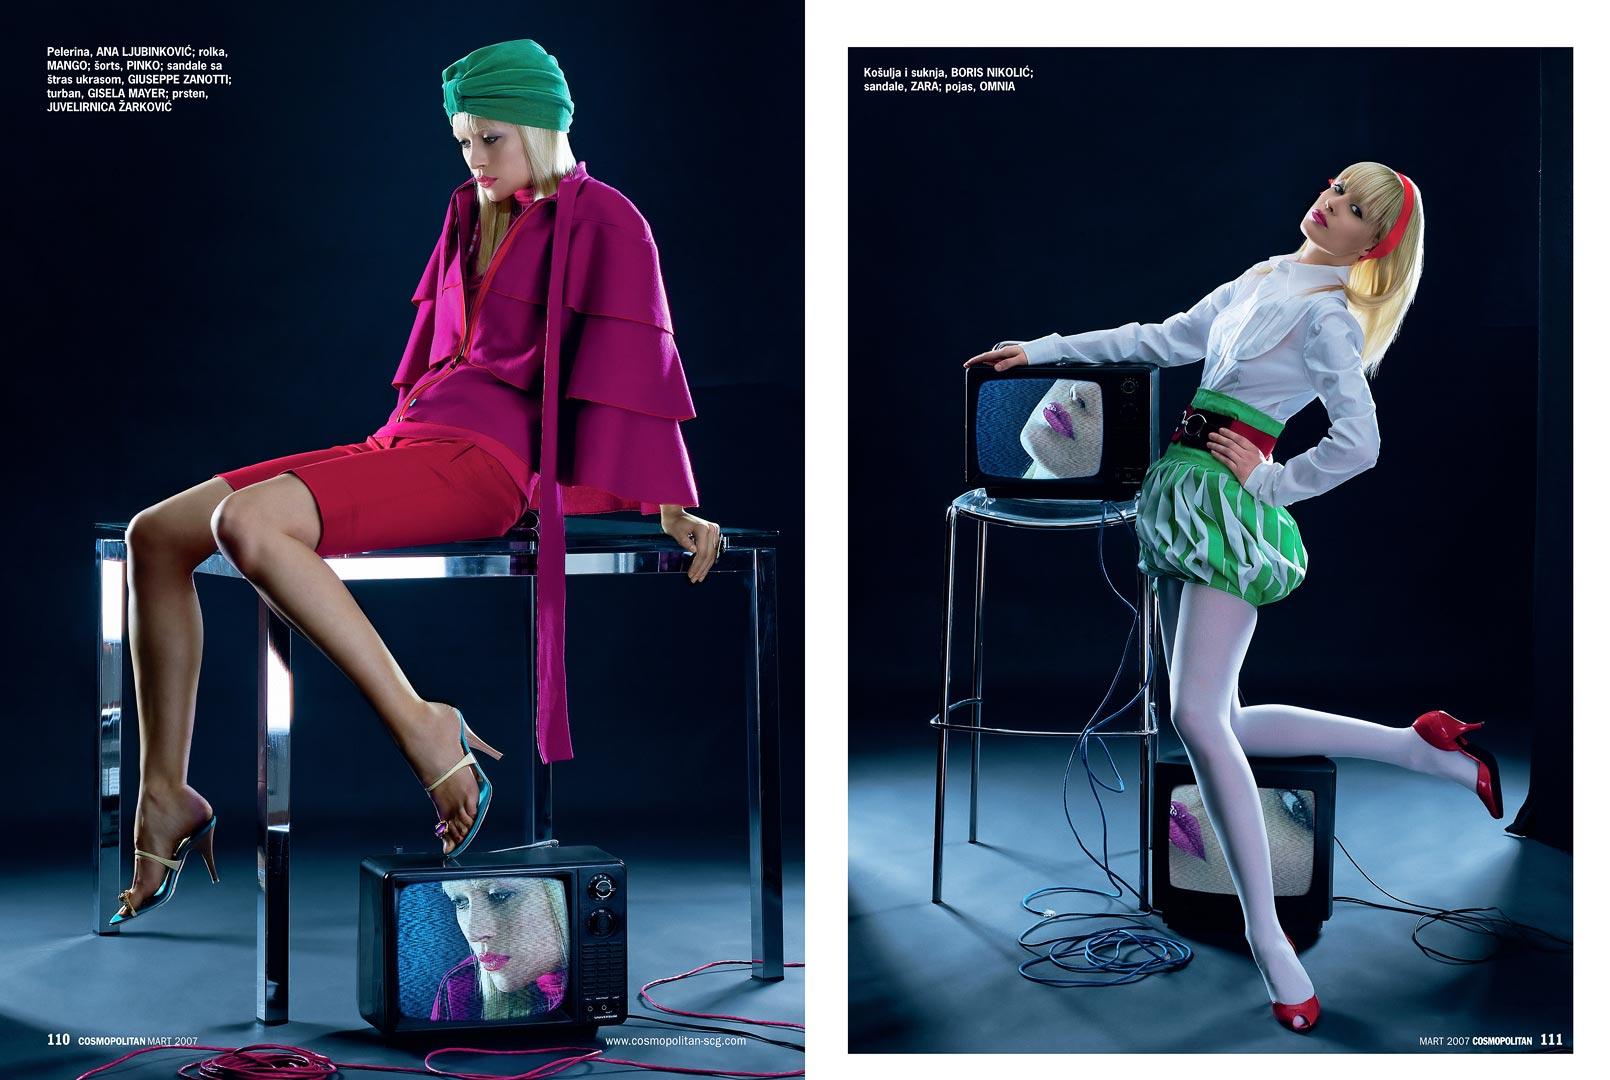 Fashion Magazine Editor?